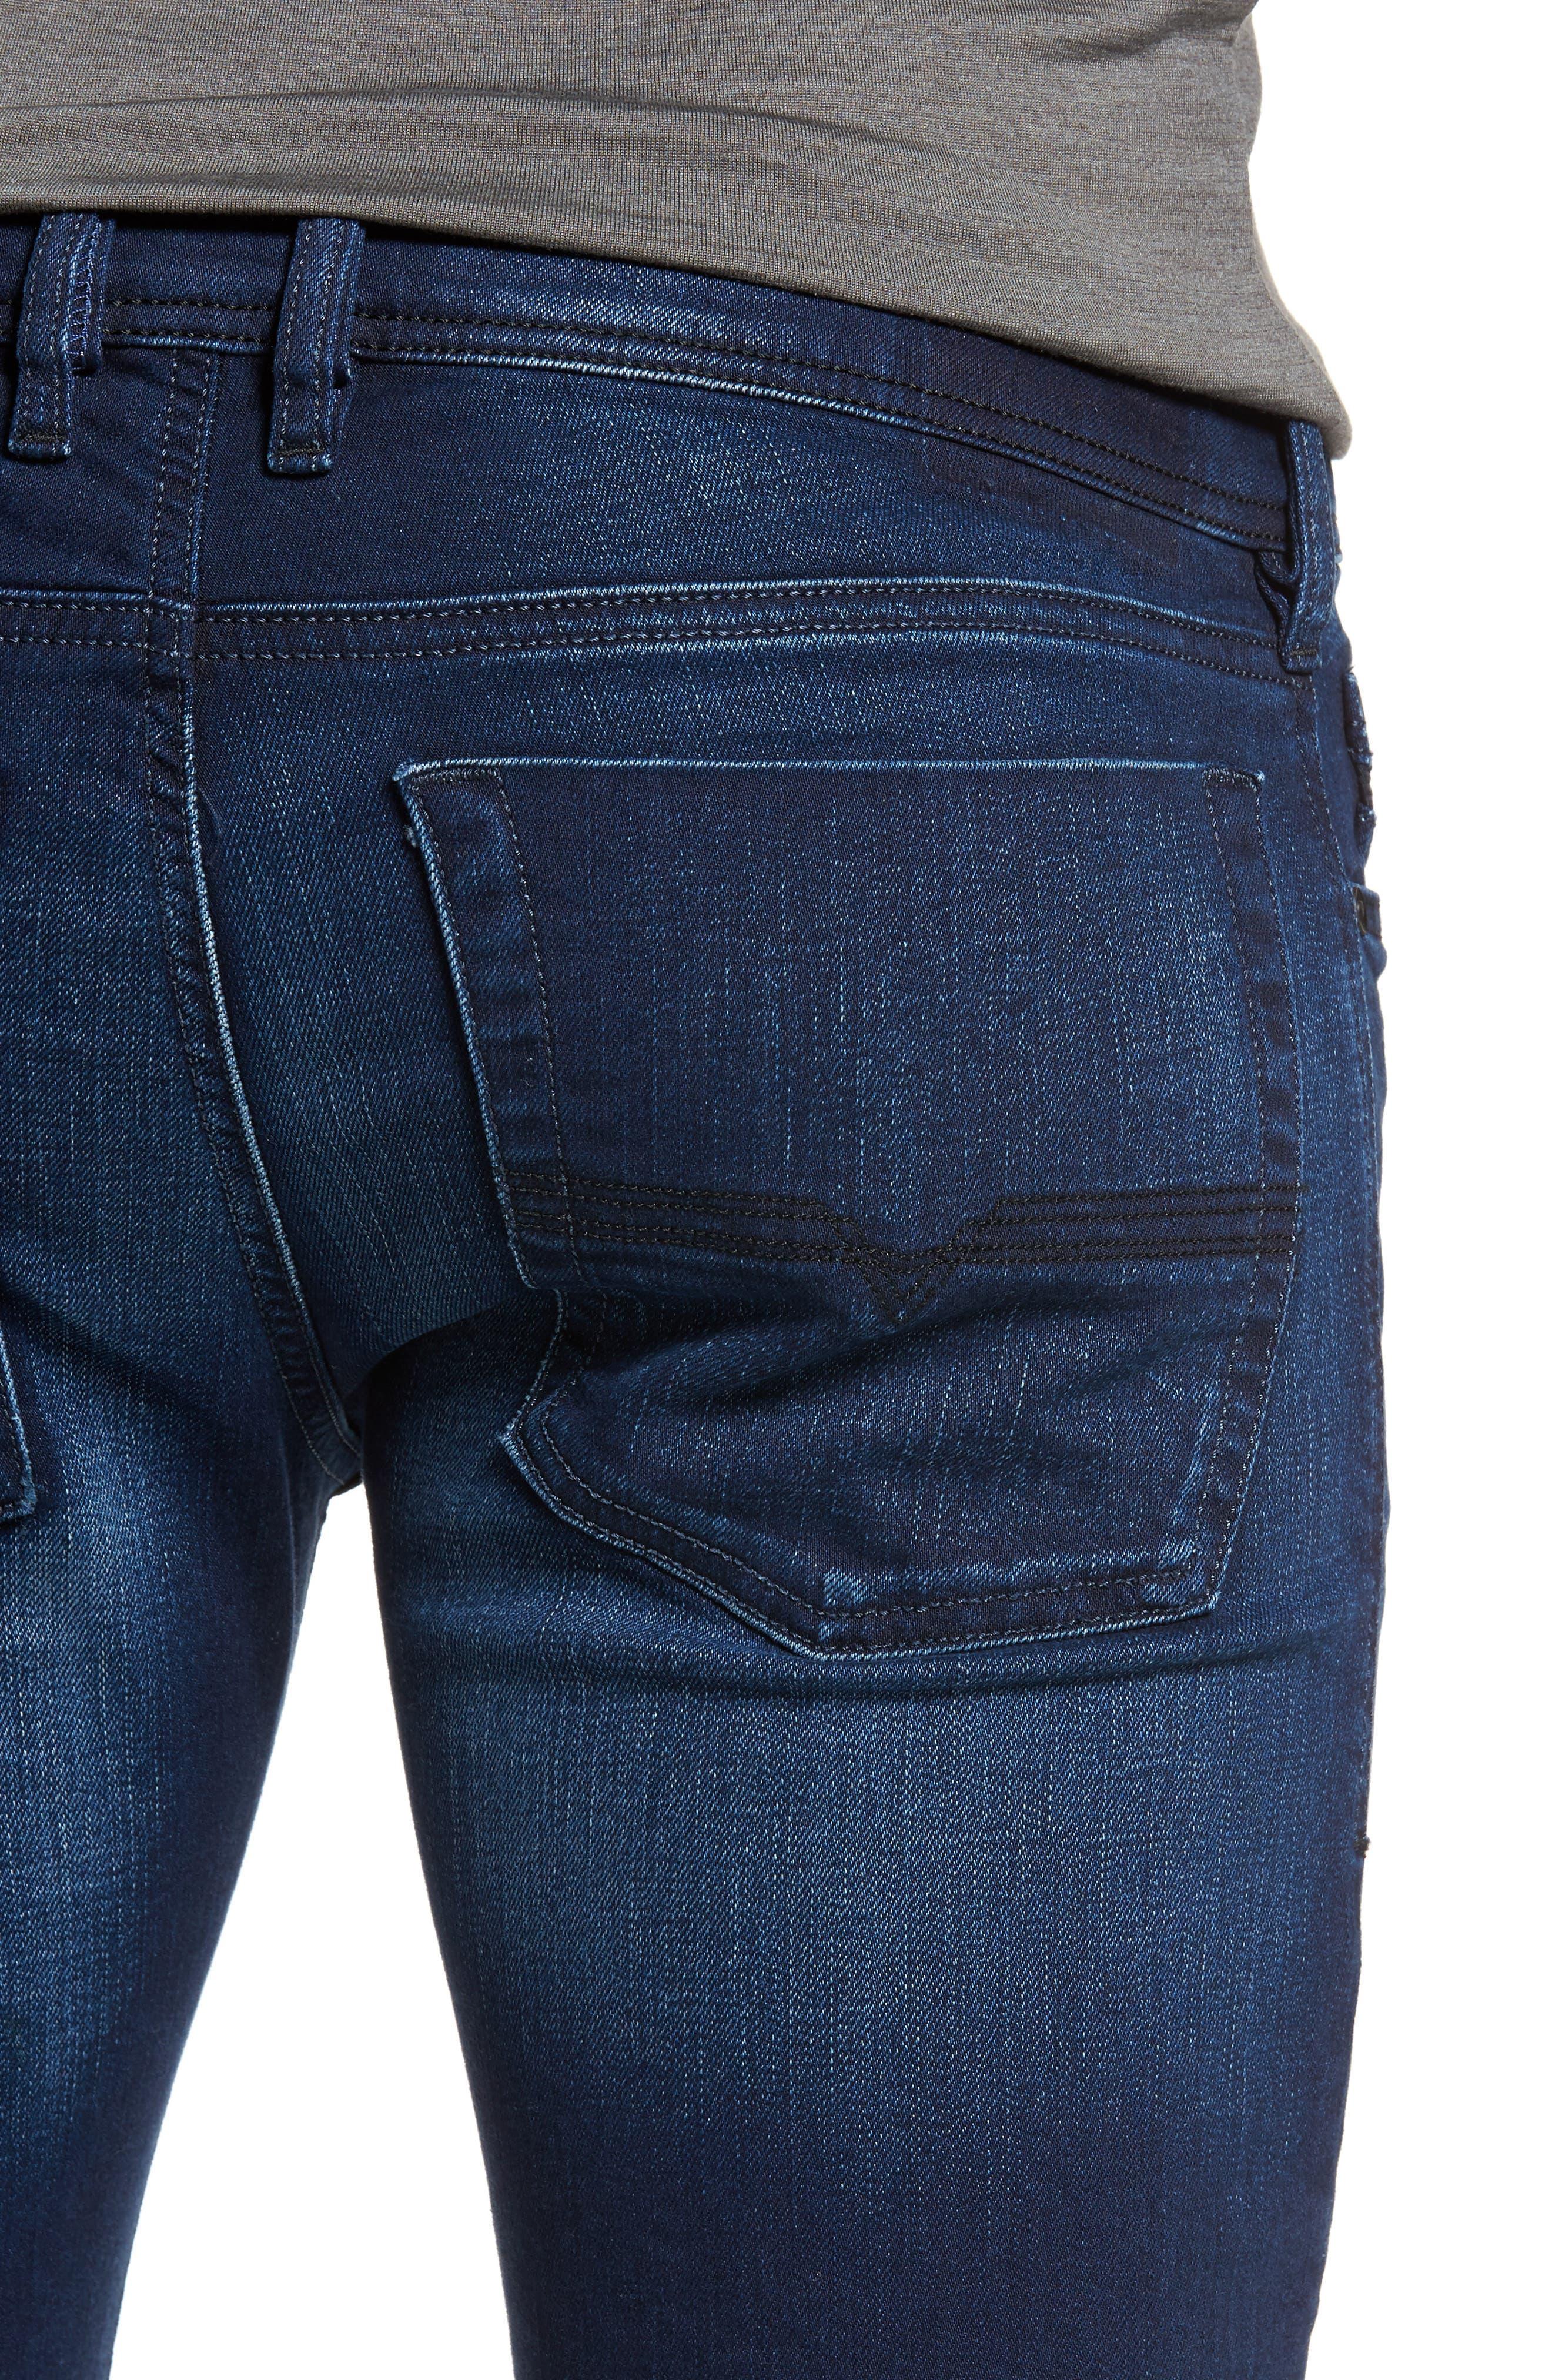 Zatiny Bootcut Jeans,                             Alternate thumbnail 4, color,                             400